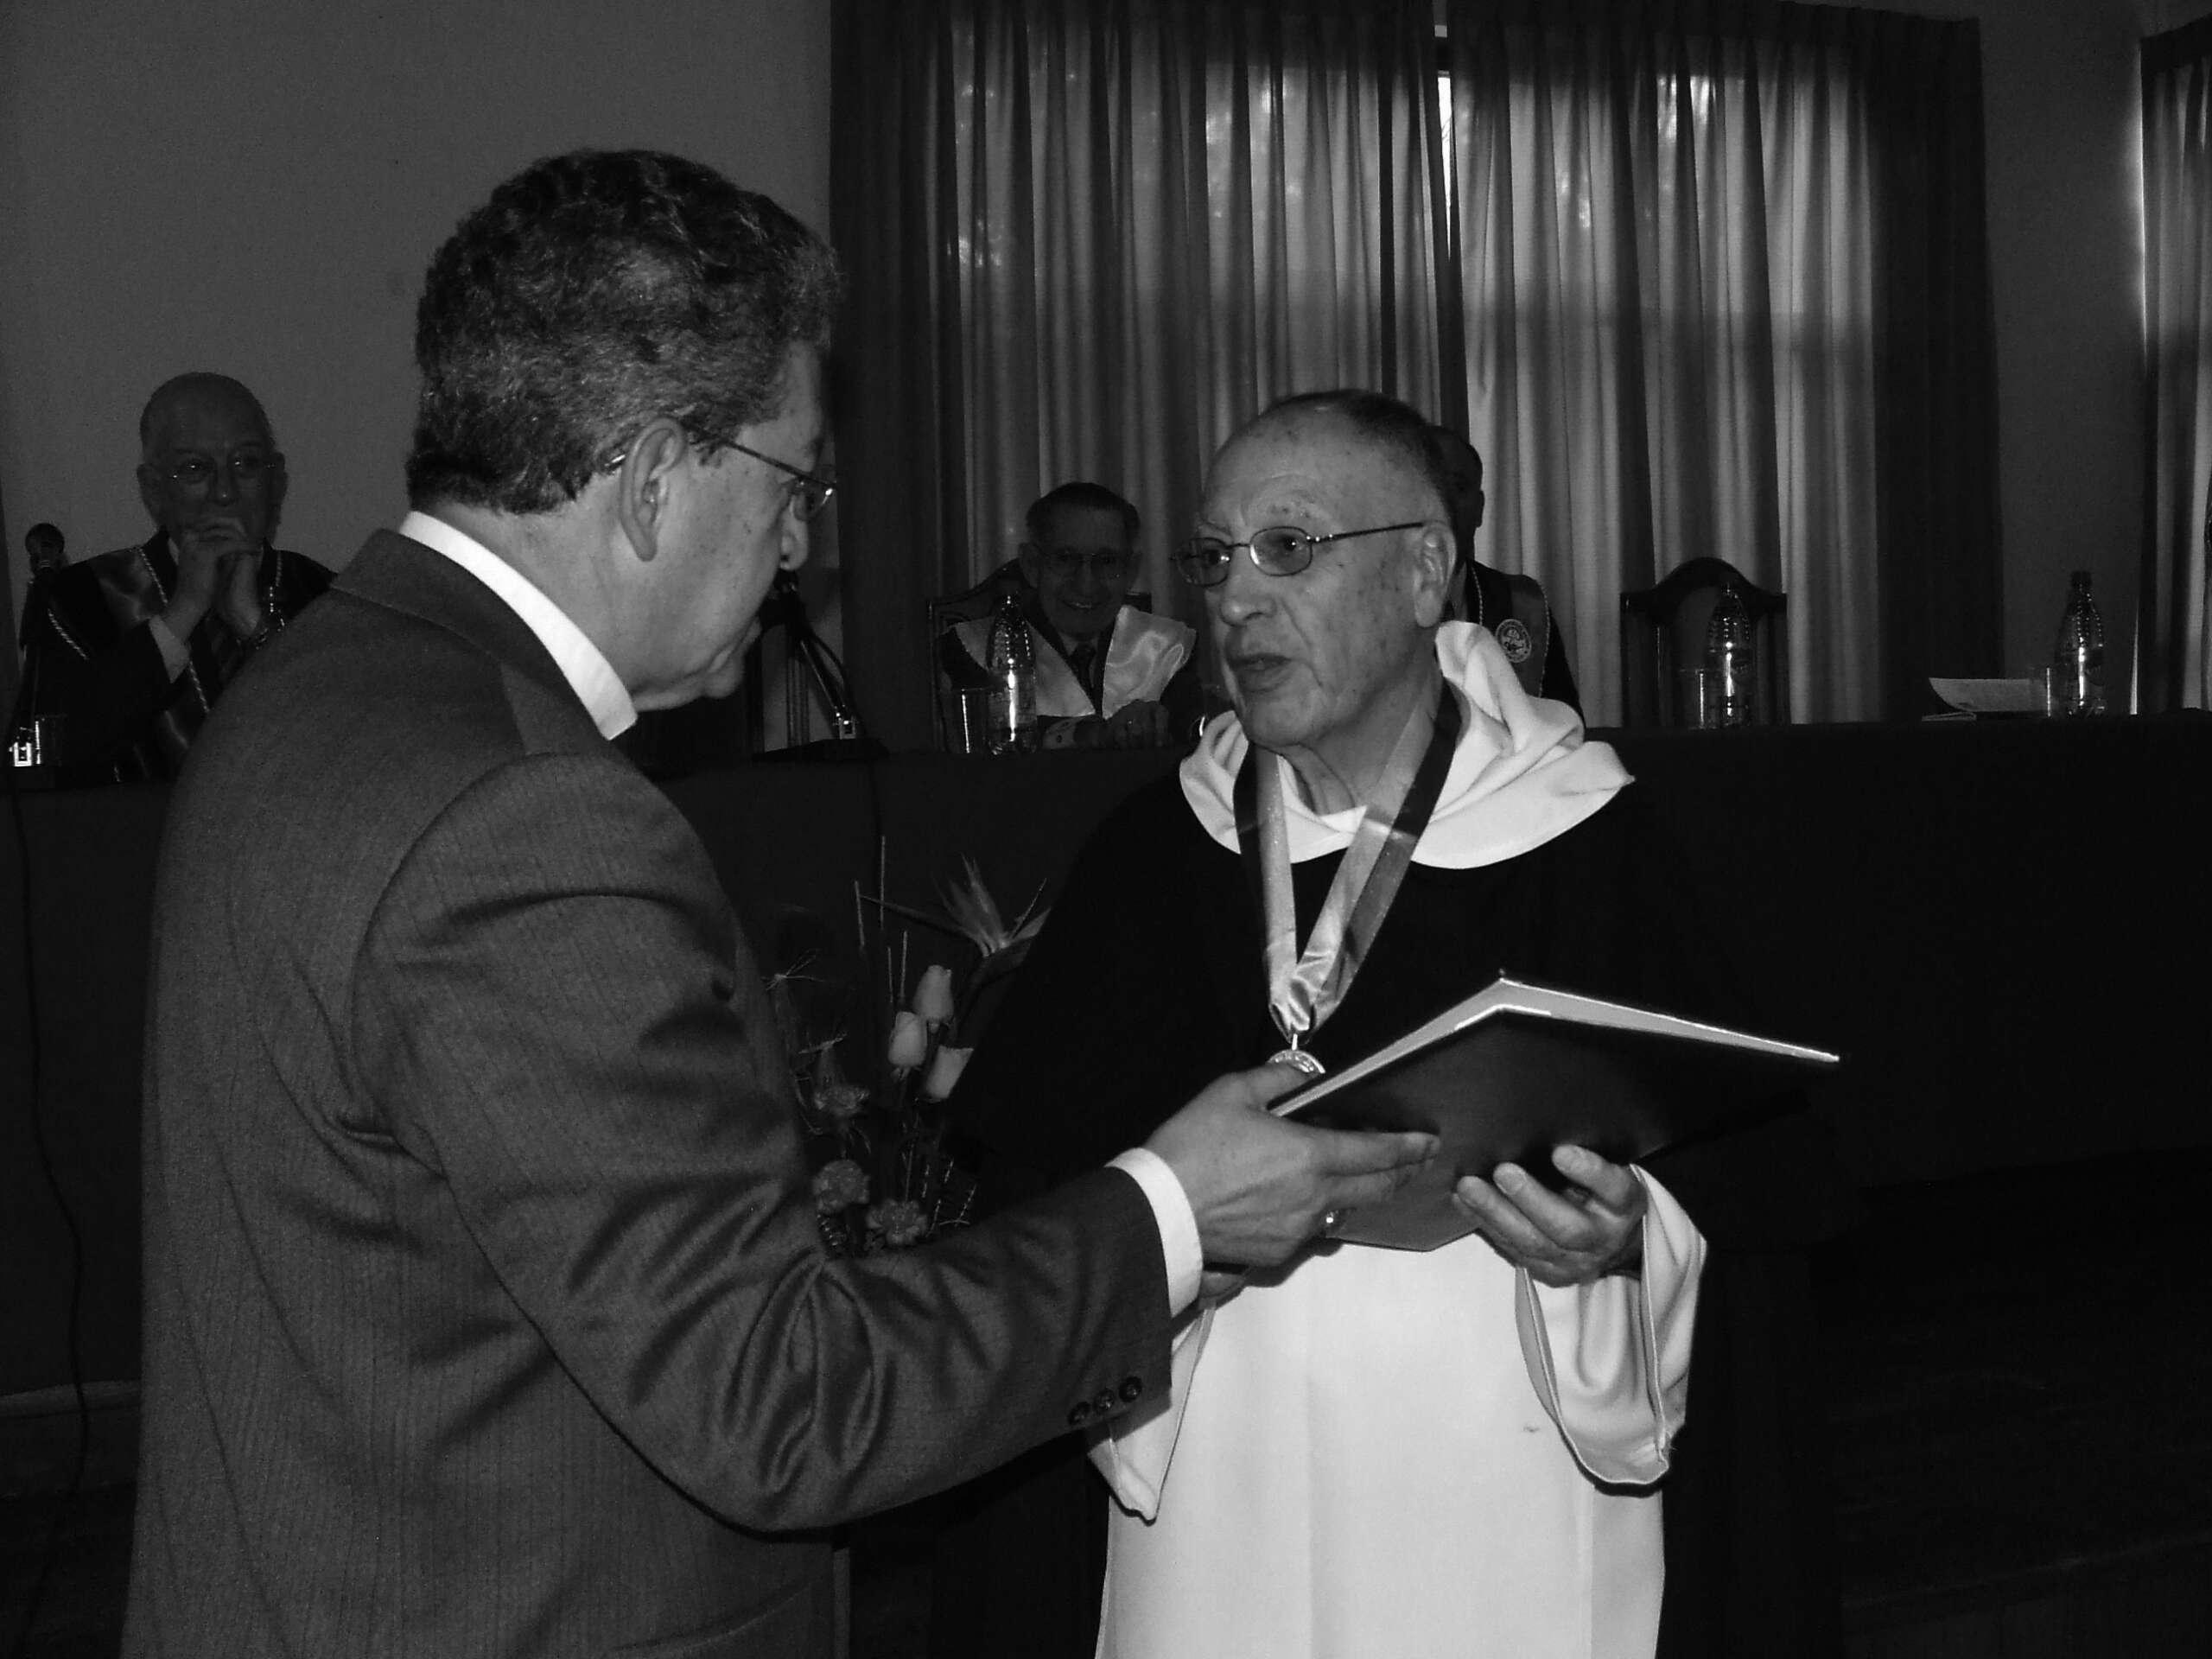 Doctor Honoris Causa para el Padre Oscar Uzin